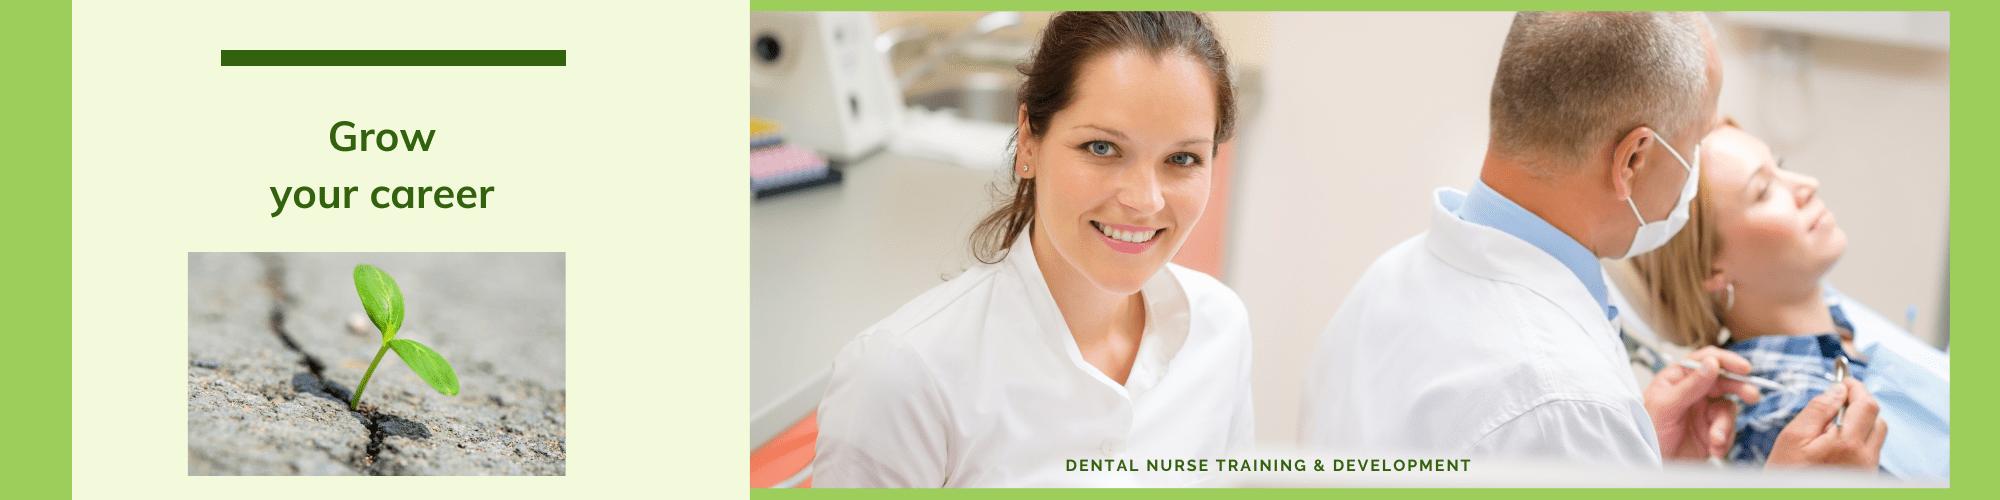 dental nurse training nebdn